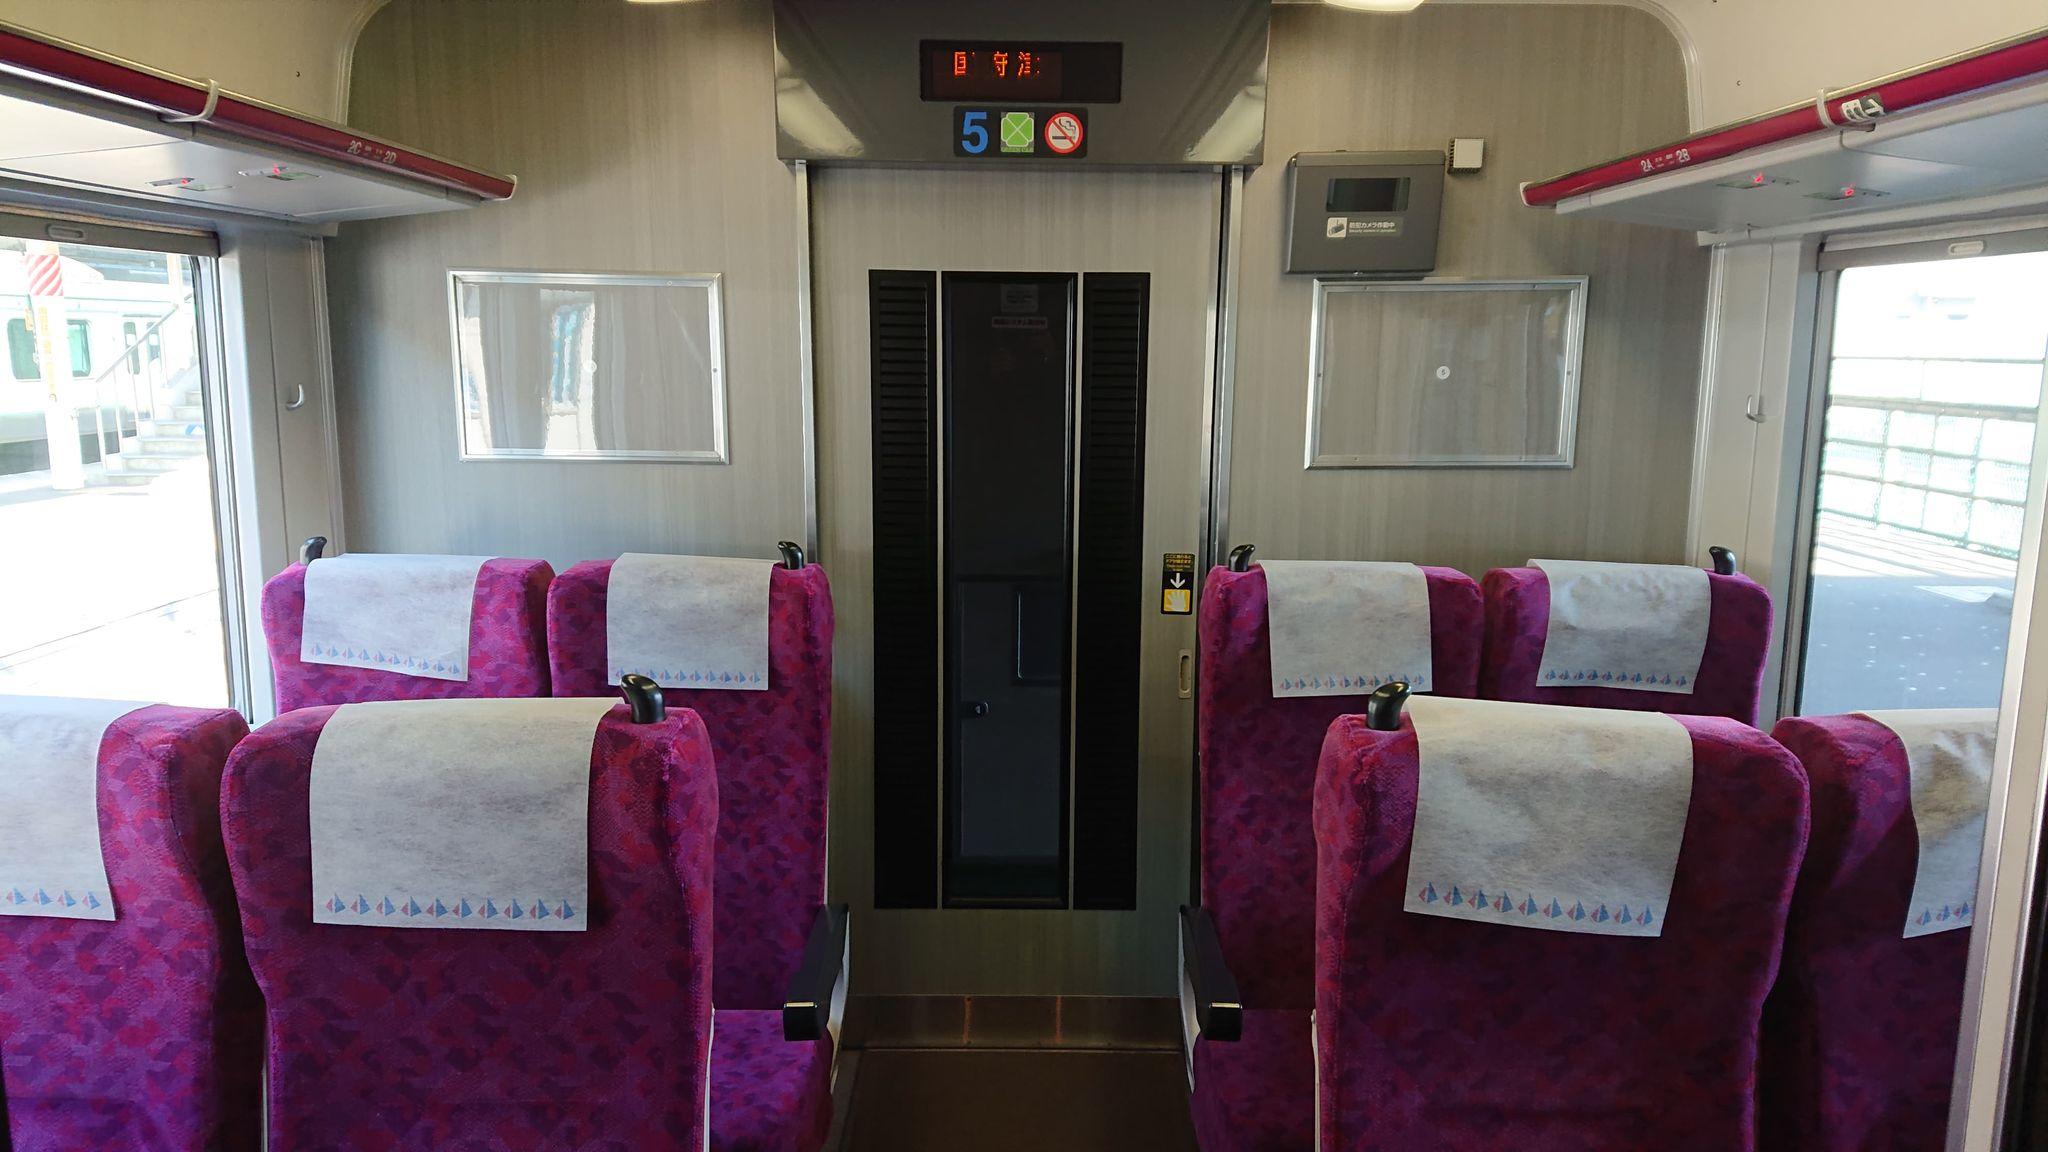 JR東日本東海道線や湘南新宿ライン、上野東京ラインの普通列車グリーン席の車内の雰囲気